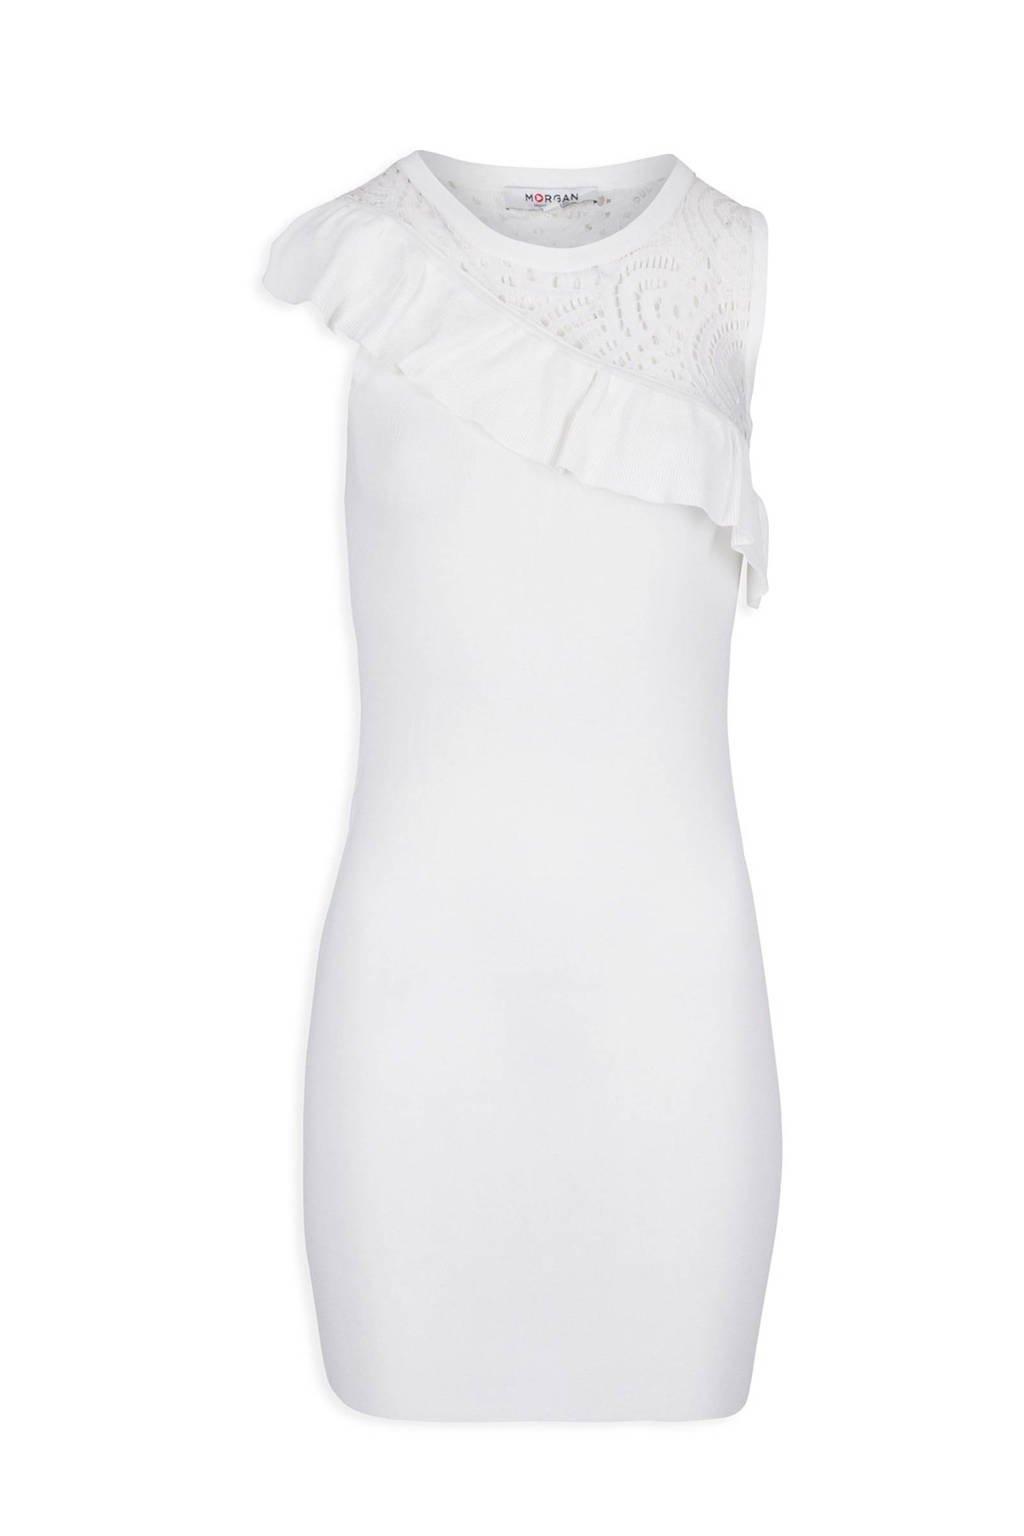 Morgan jurk met ruches wit, Wit